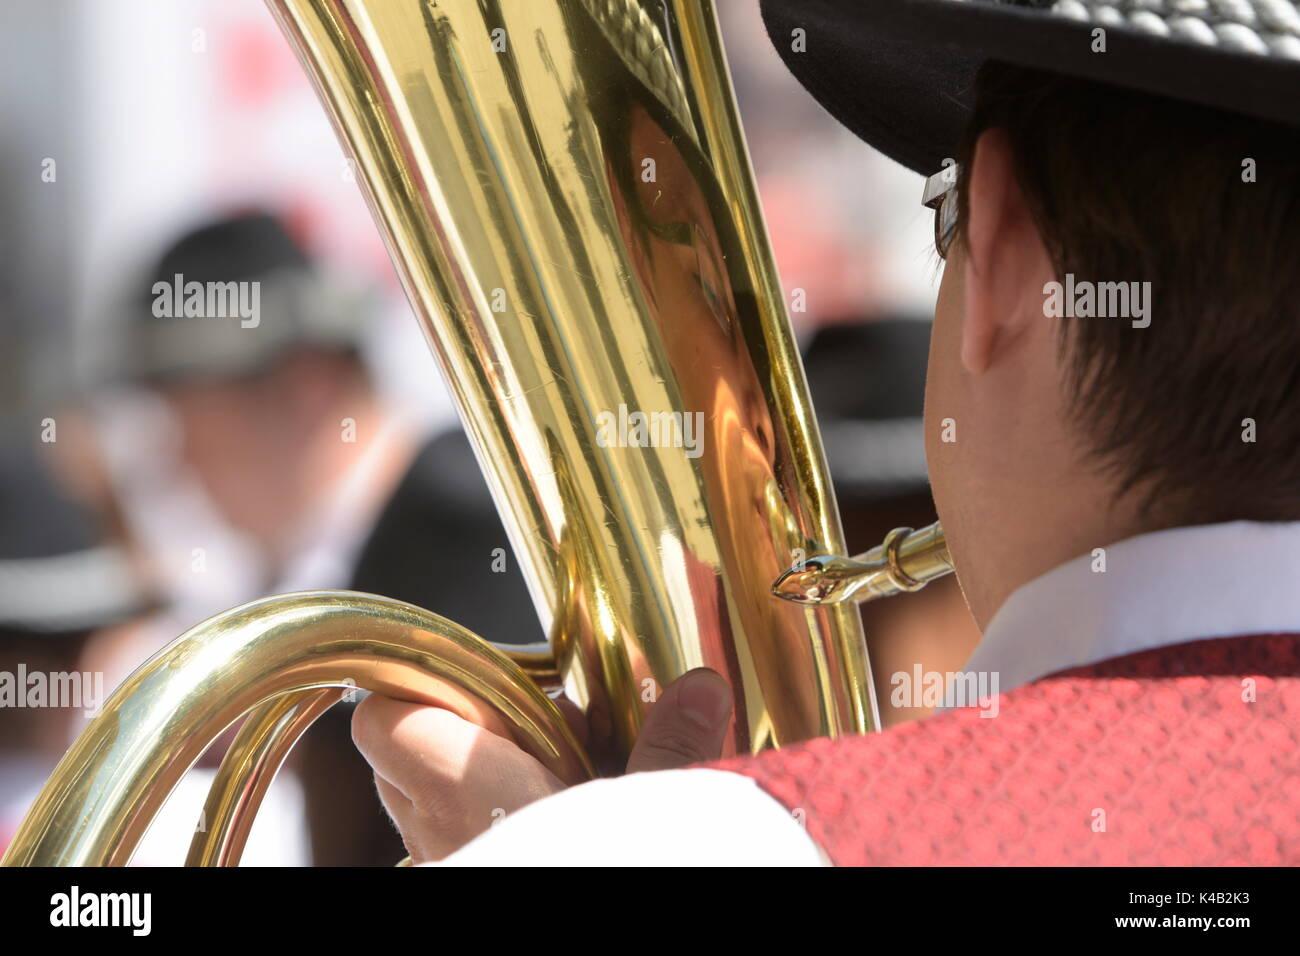 Austrian Wind Music - Stock Image